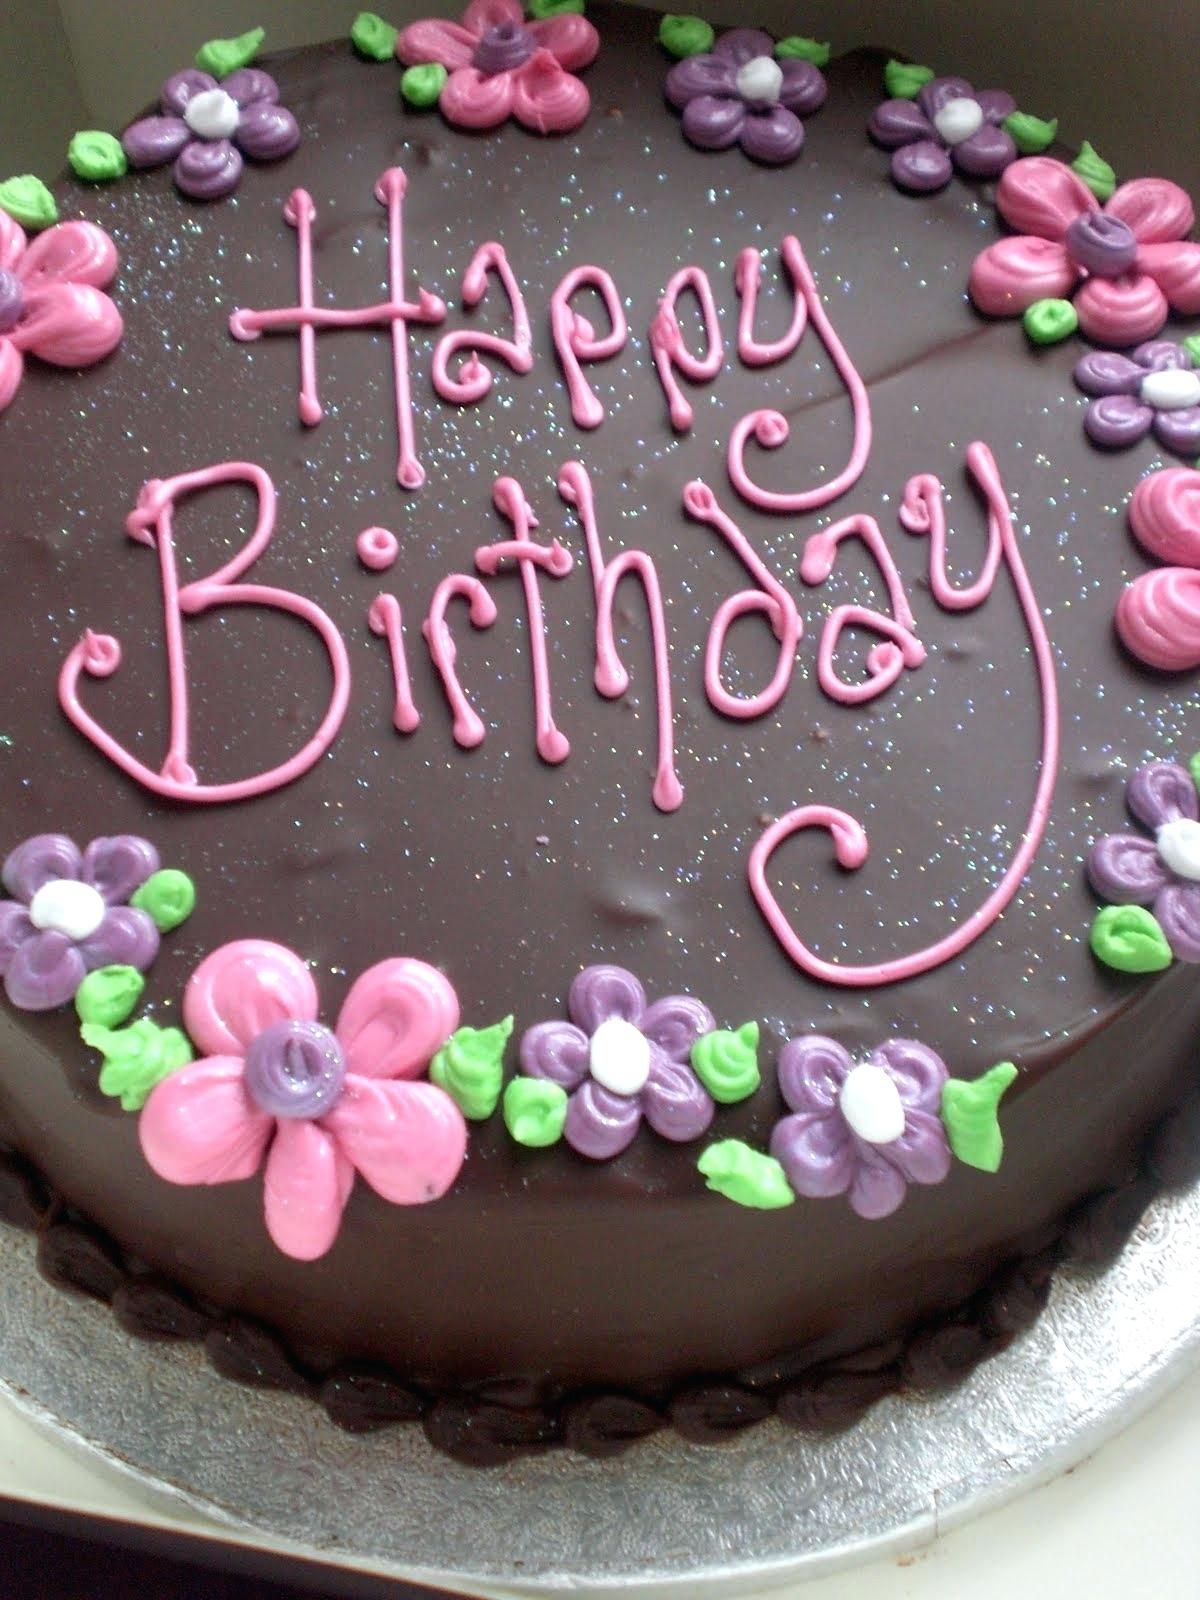 Birthday Cake Writing Name As Well As Pink Fondant Flower Cake Pics For Name Bir Happy Birthday Cake Images Happy Birthday Chocolate Cake Happy Birthday Cakes